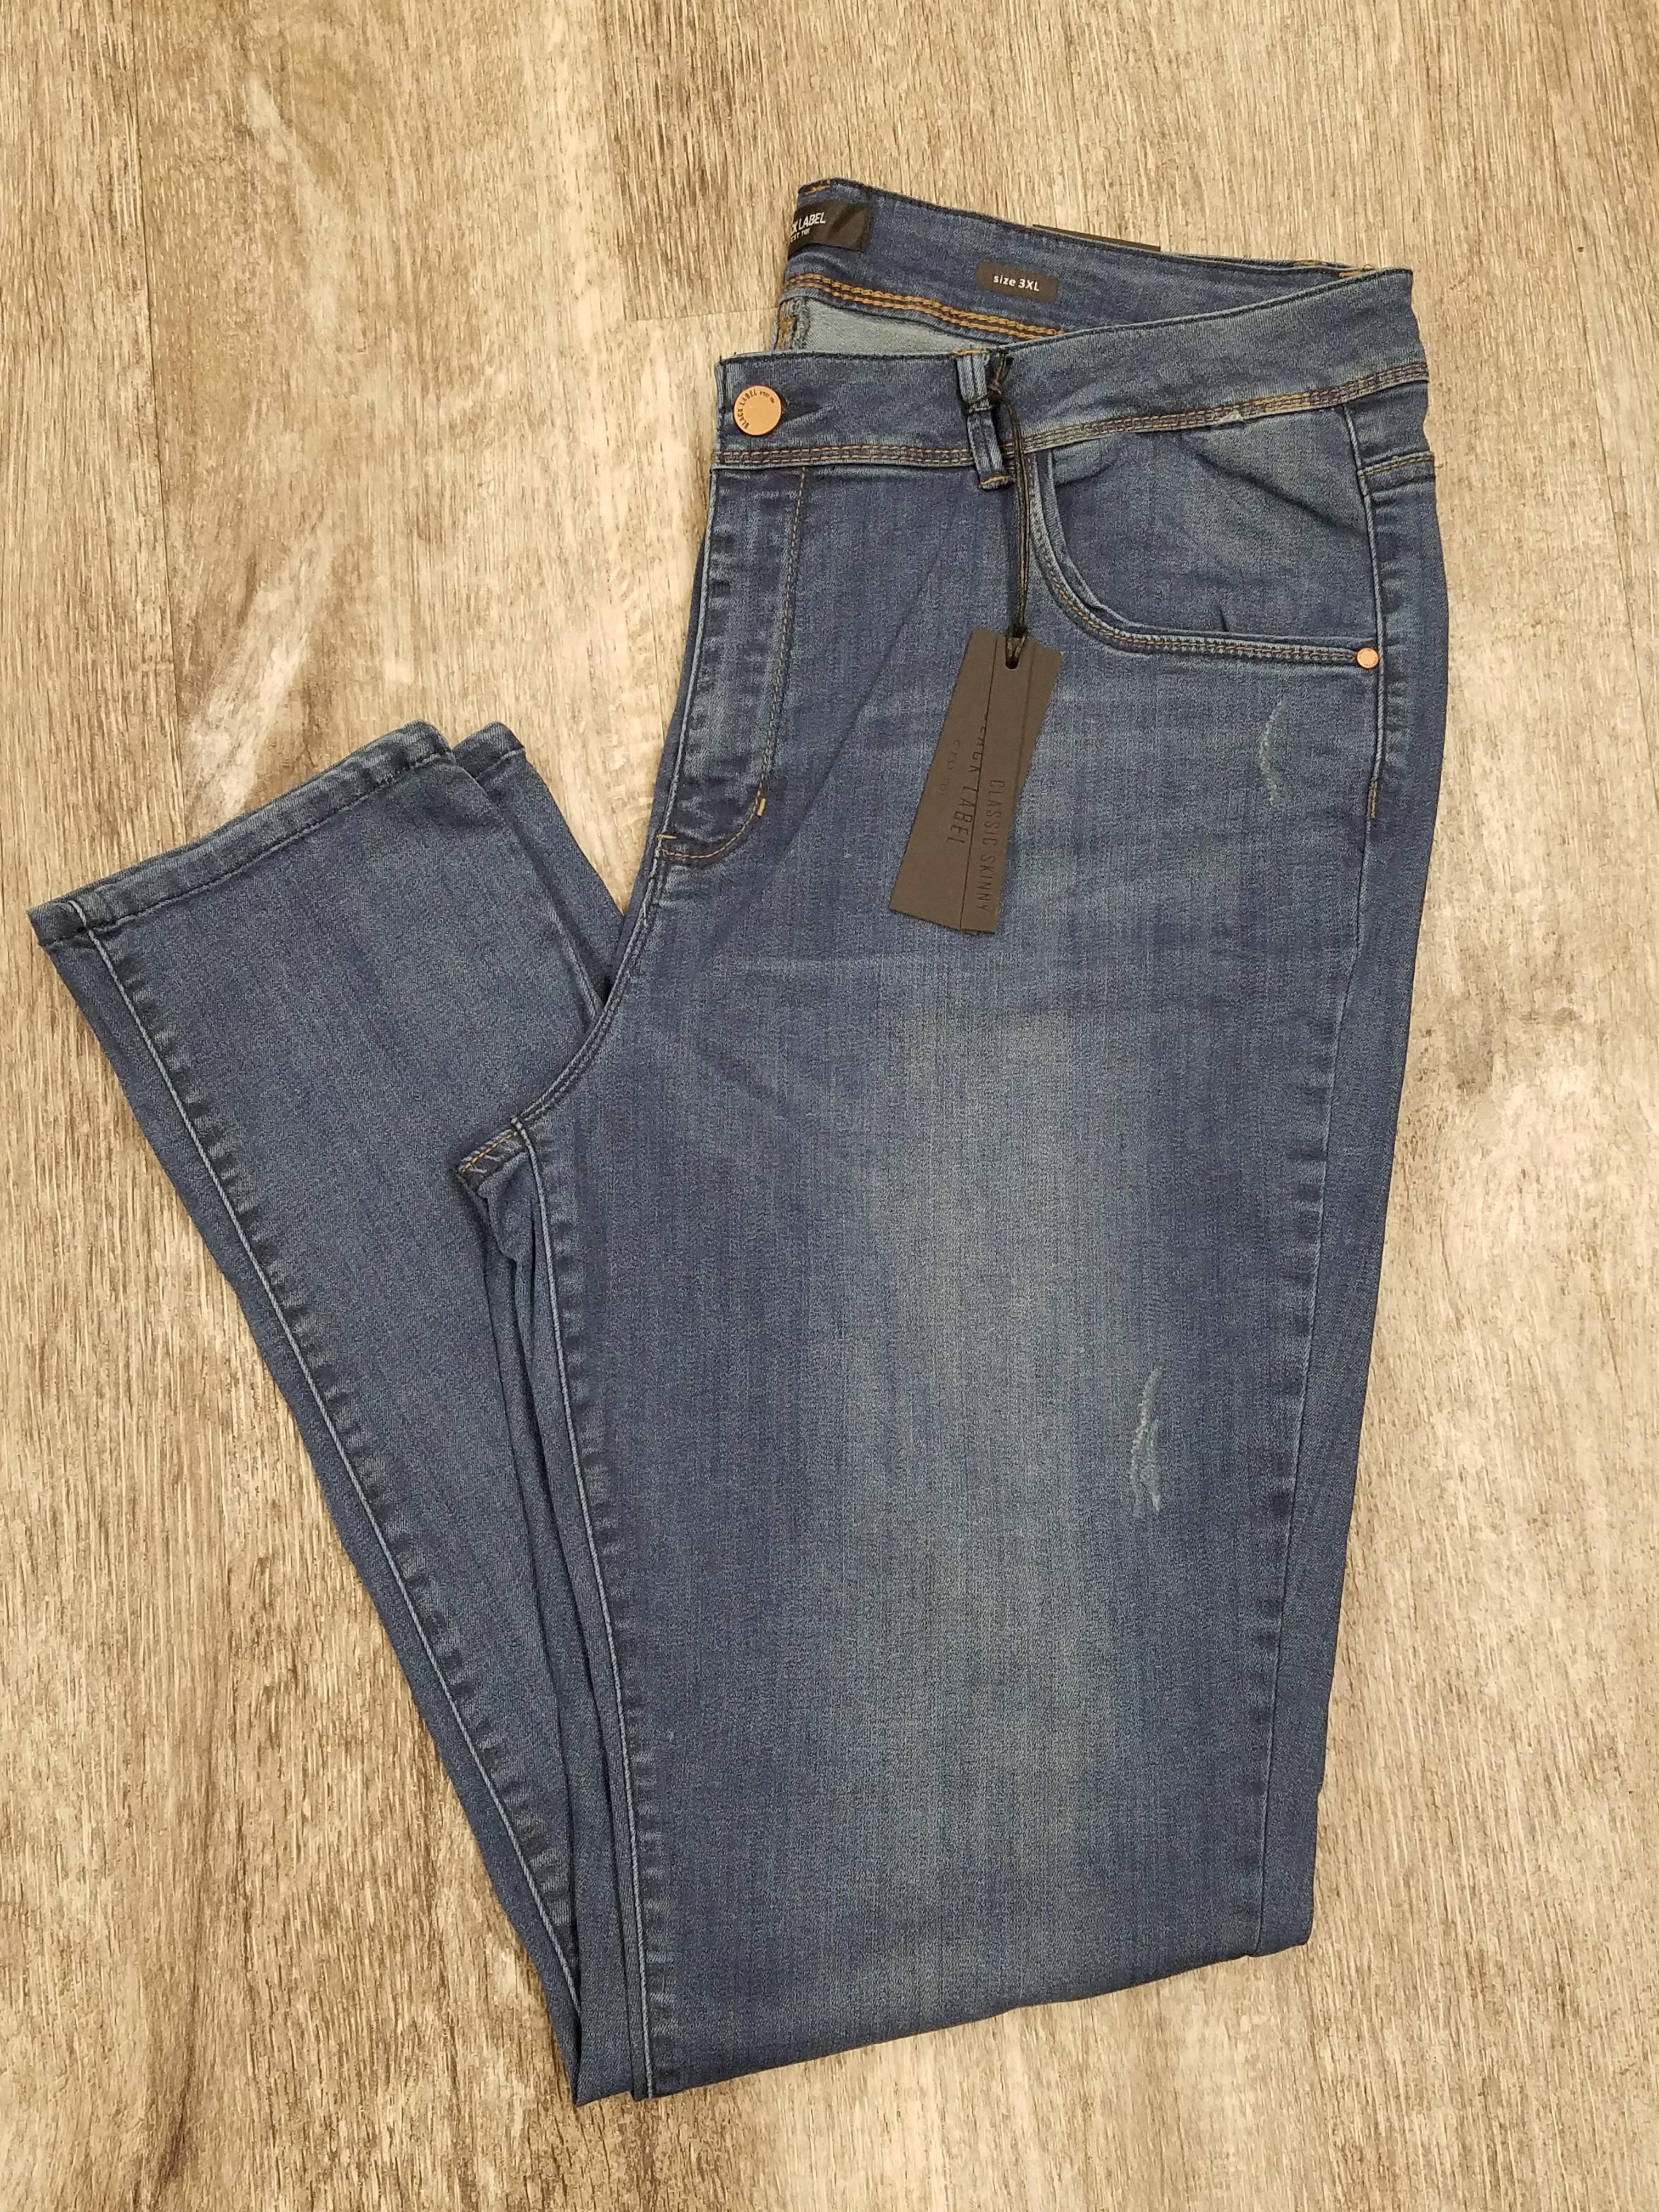 Dark Denim Classic Skinny Jean *Curvy Approved*